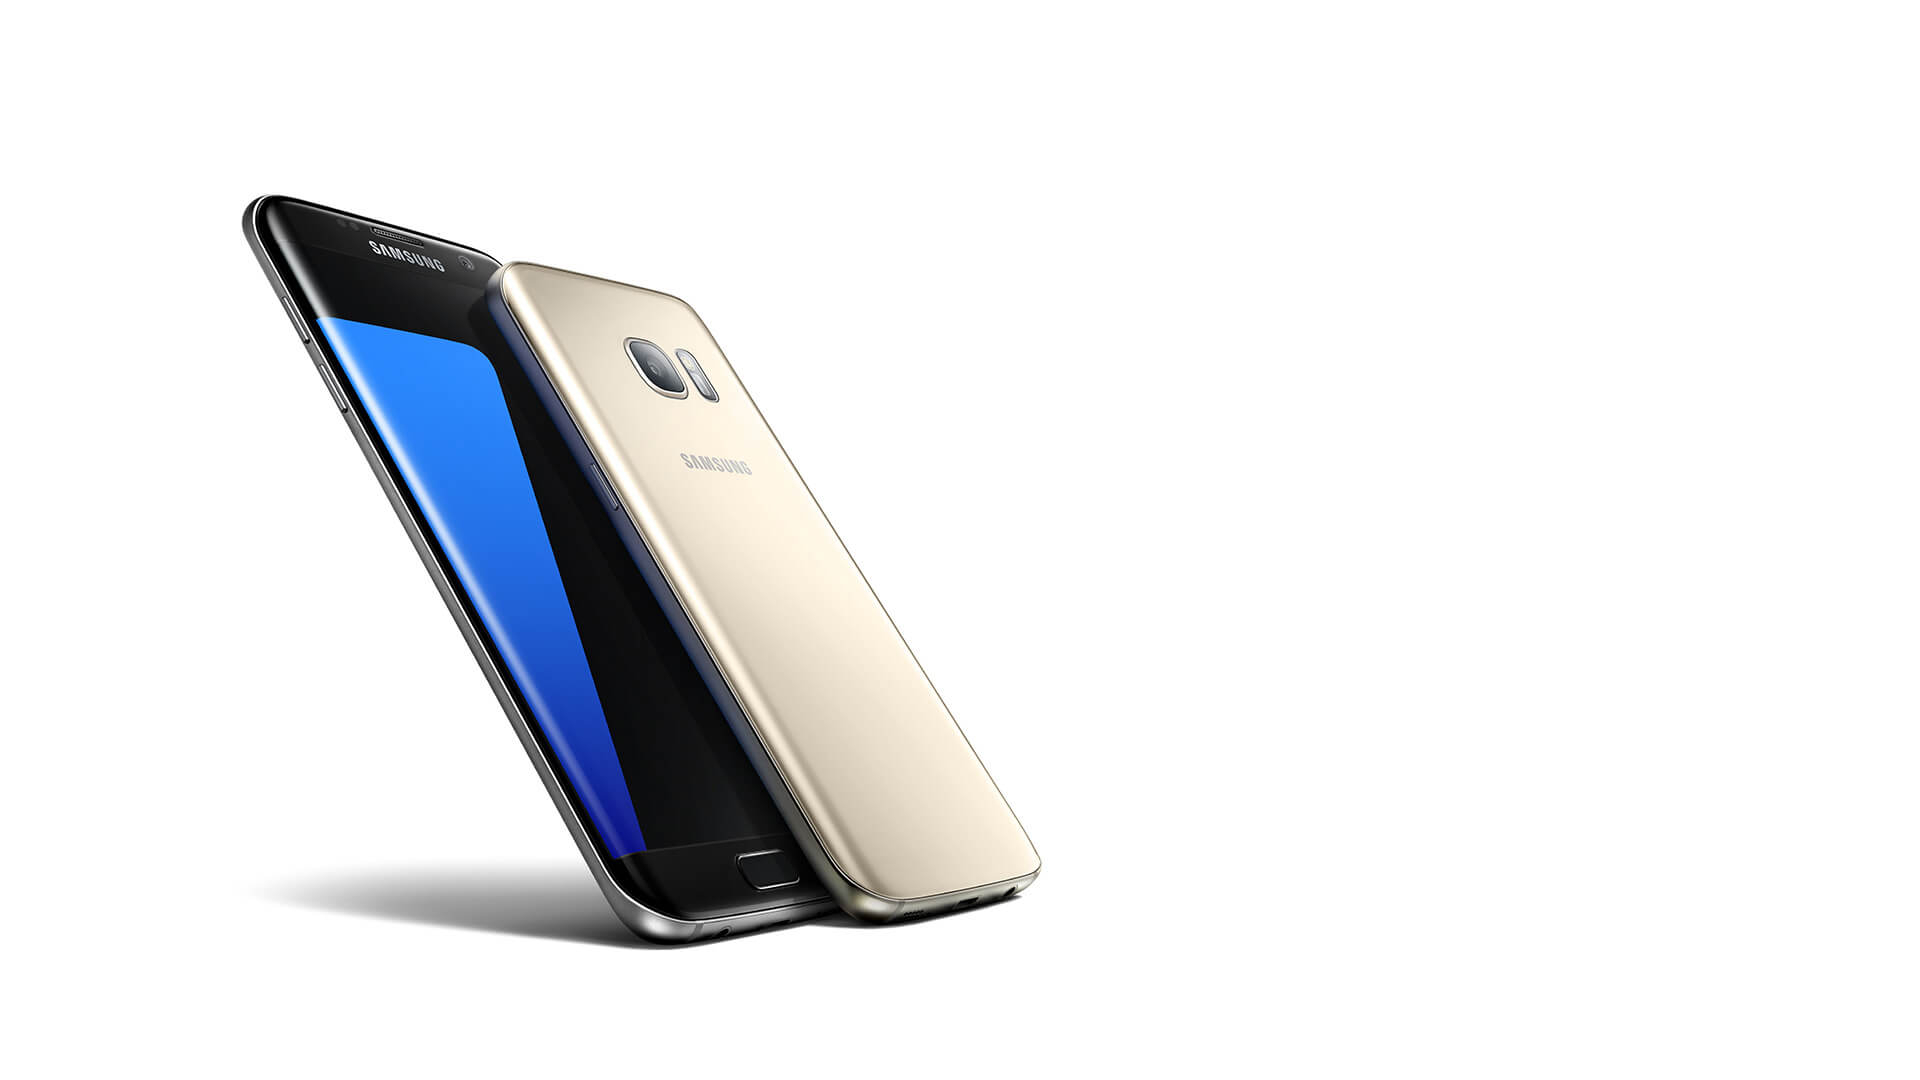 Super szybka galaktyka od Samsunga